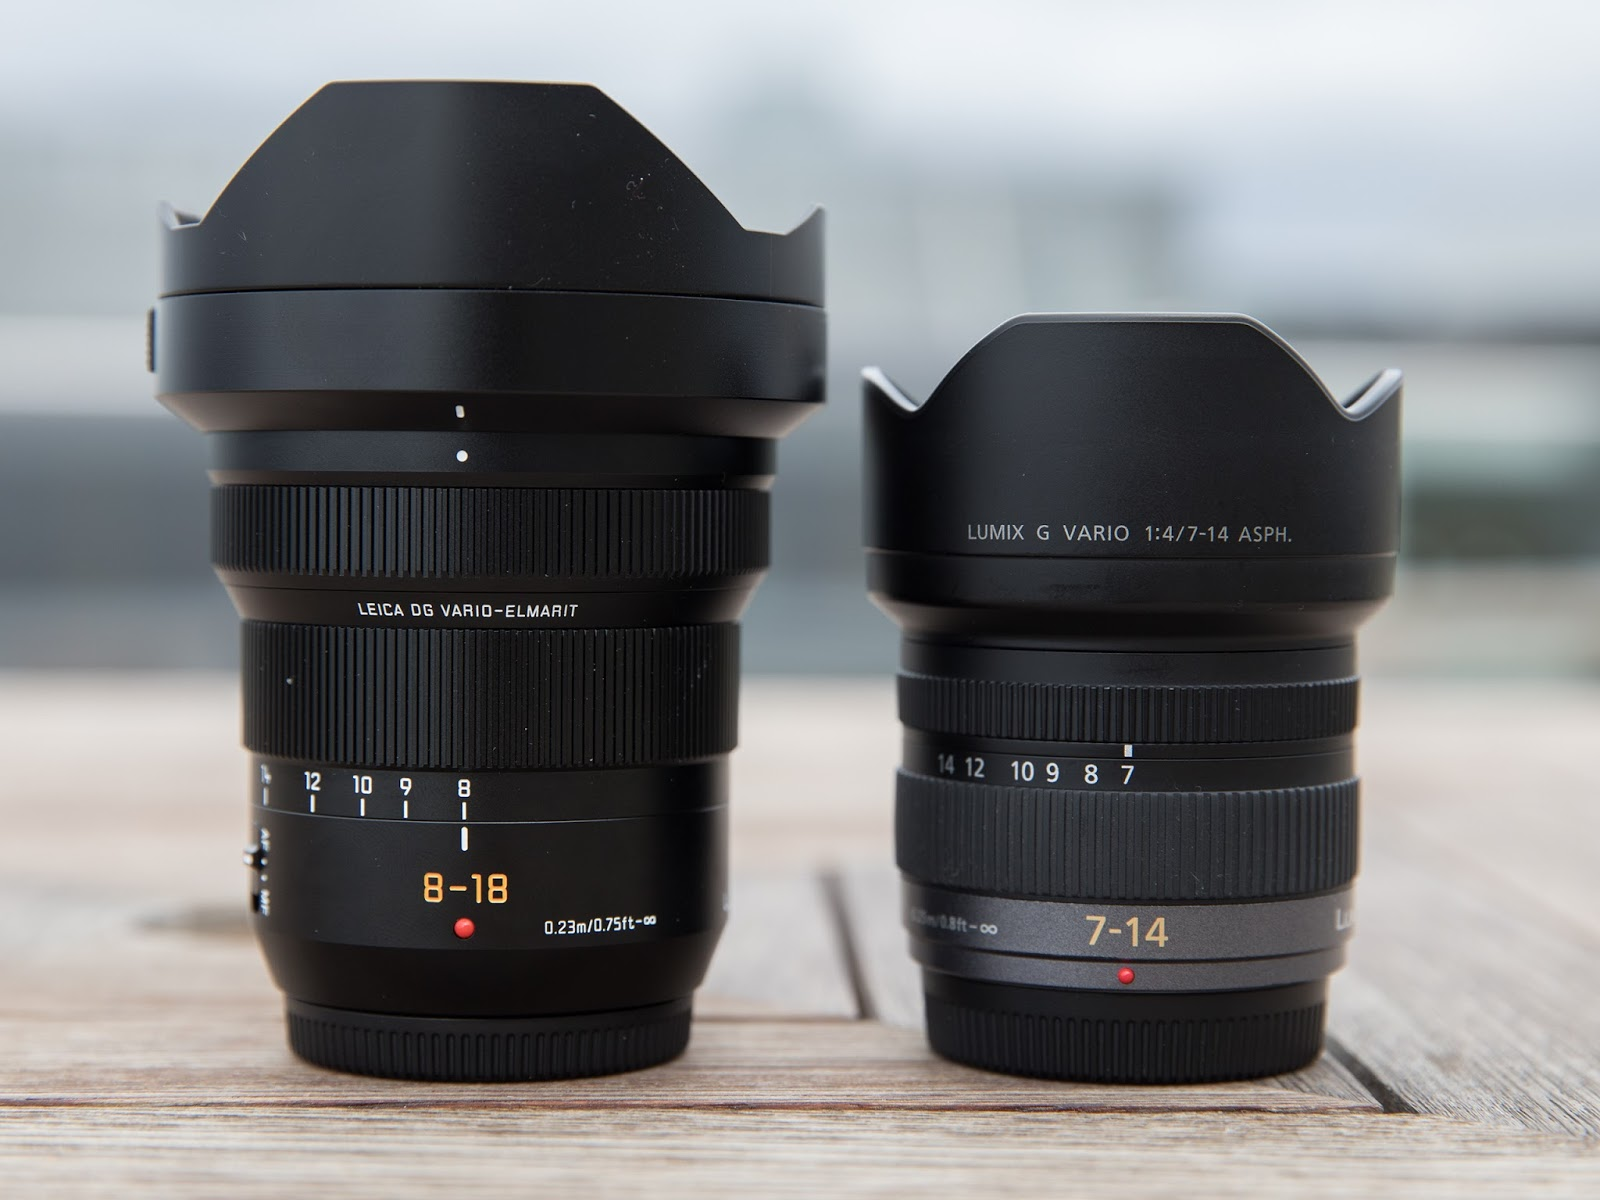 Panasonic Leica DG Vario-Elmarit 8-18mm f/2.8-4 Asph. и Panasonic Lumix 7-14mm f/4 Asph.